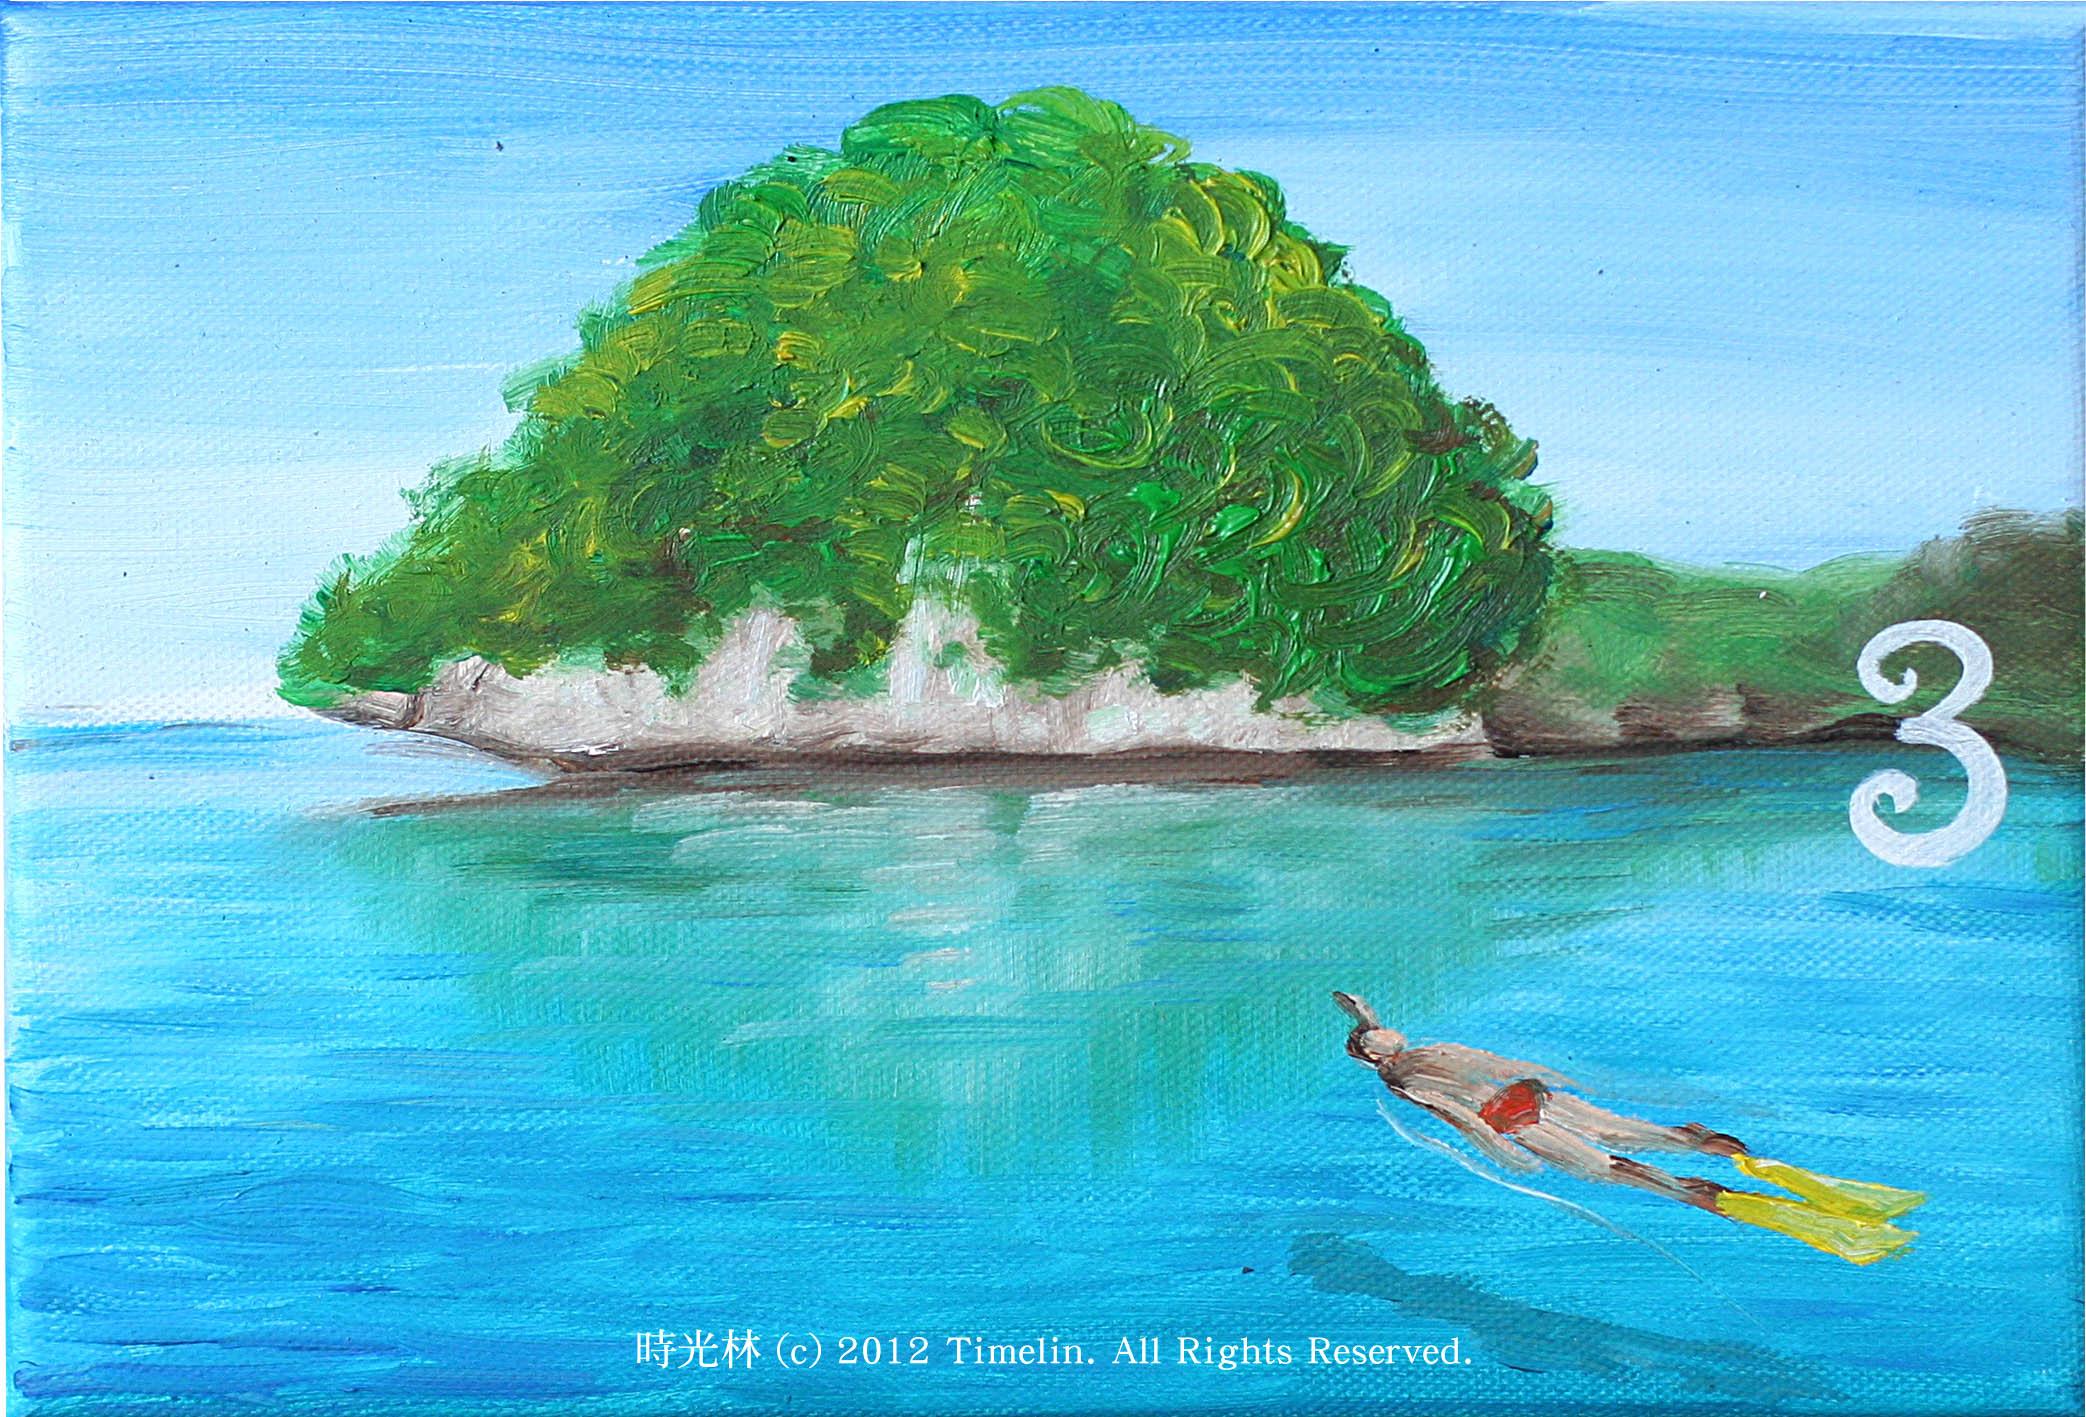 2012浮潛Snorkeling